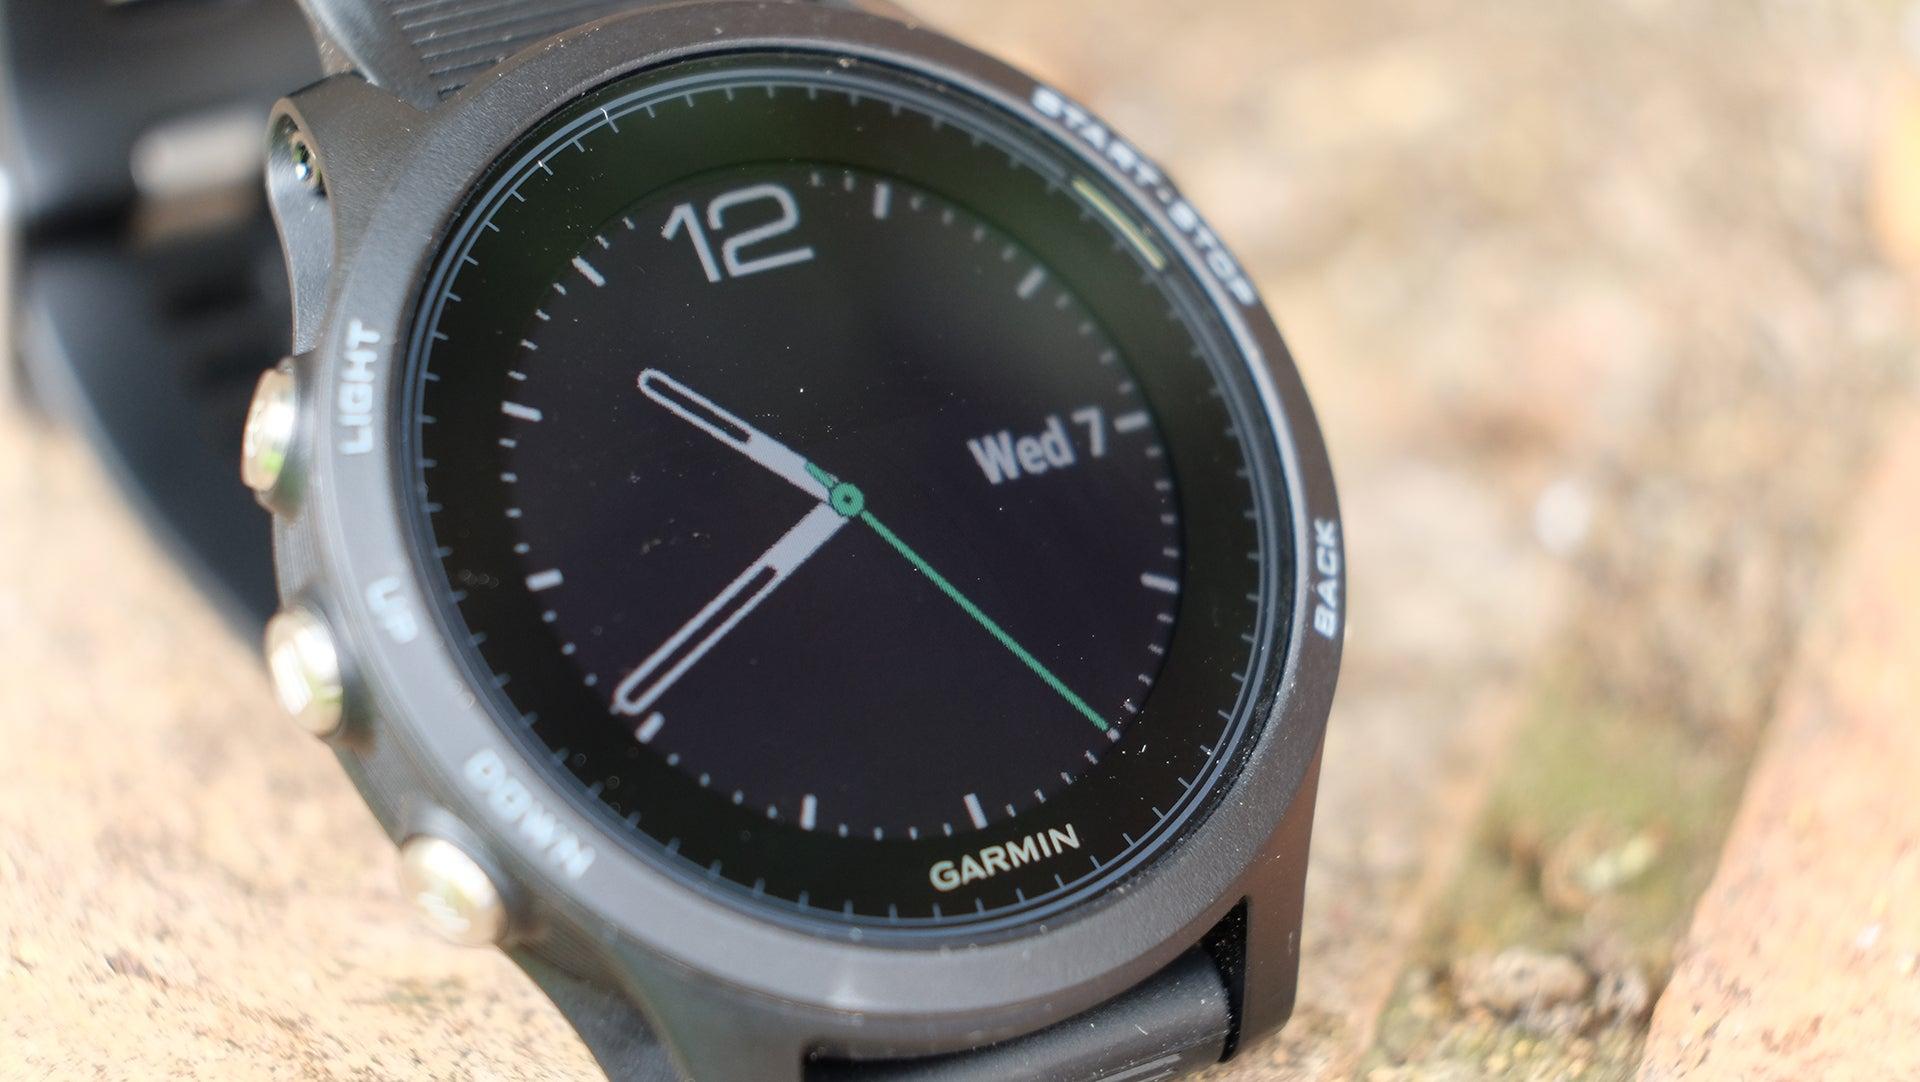 Garmin Forerunner 935 Review Trusted Reviews